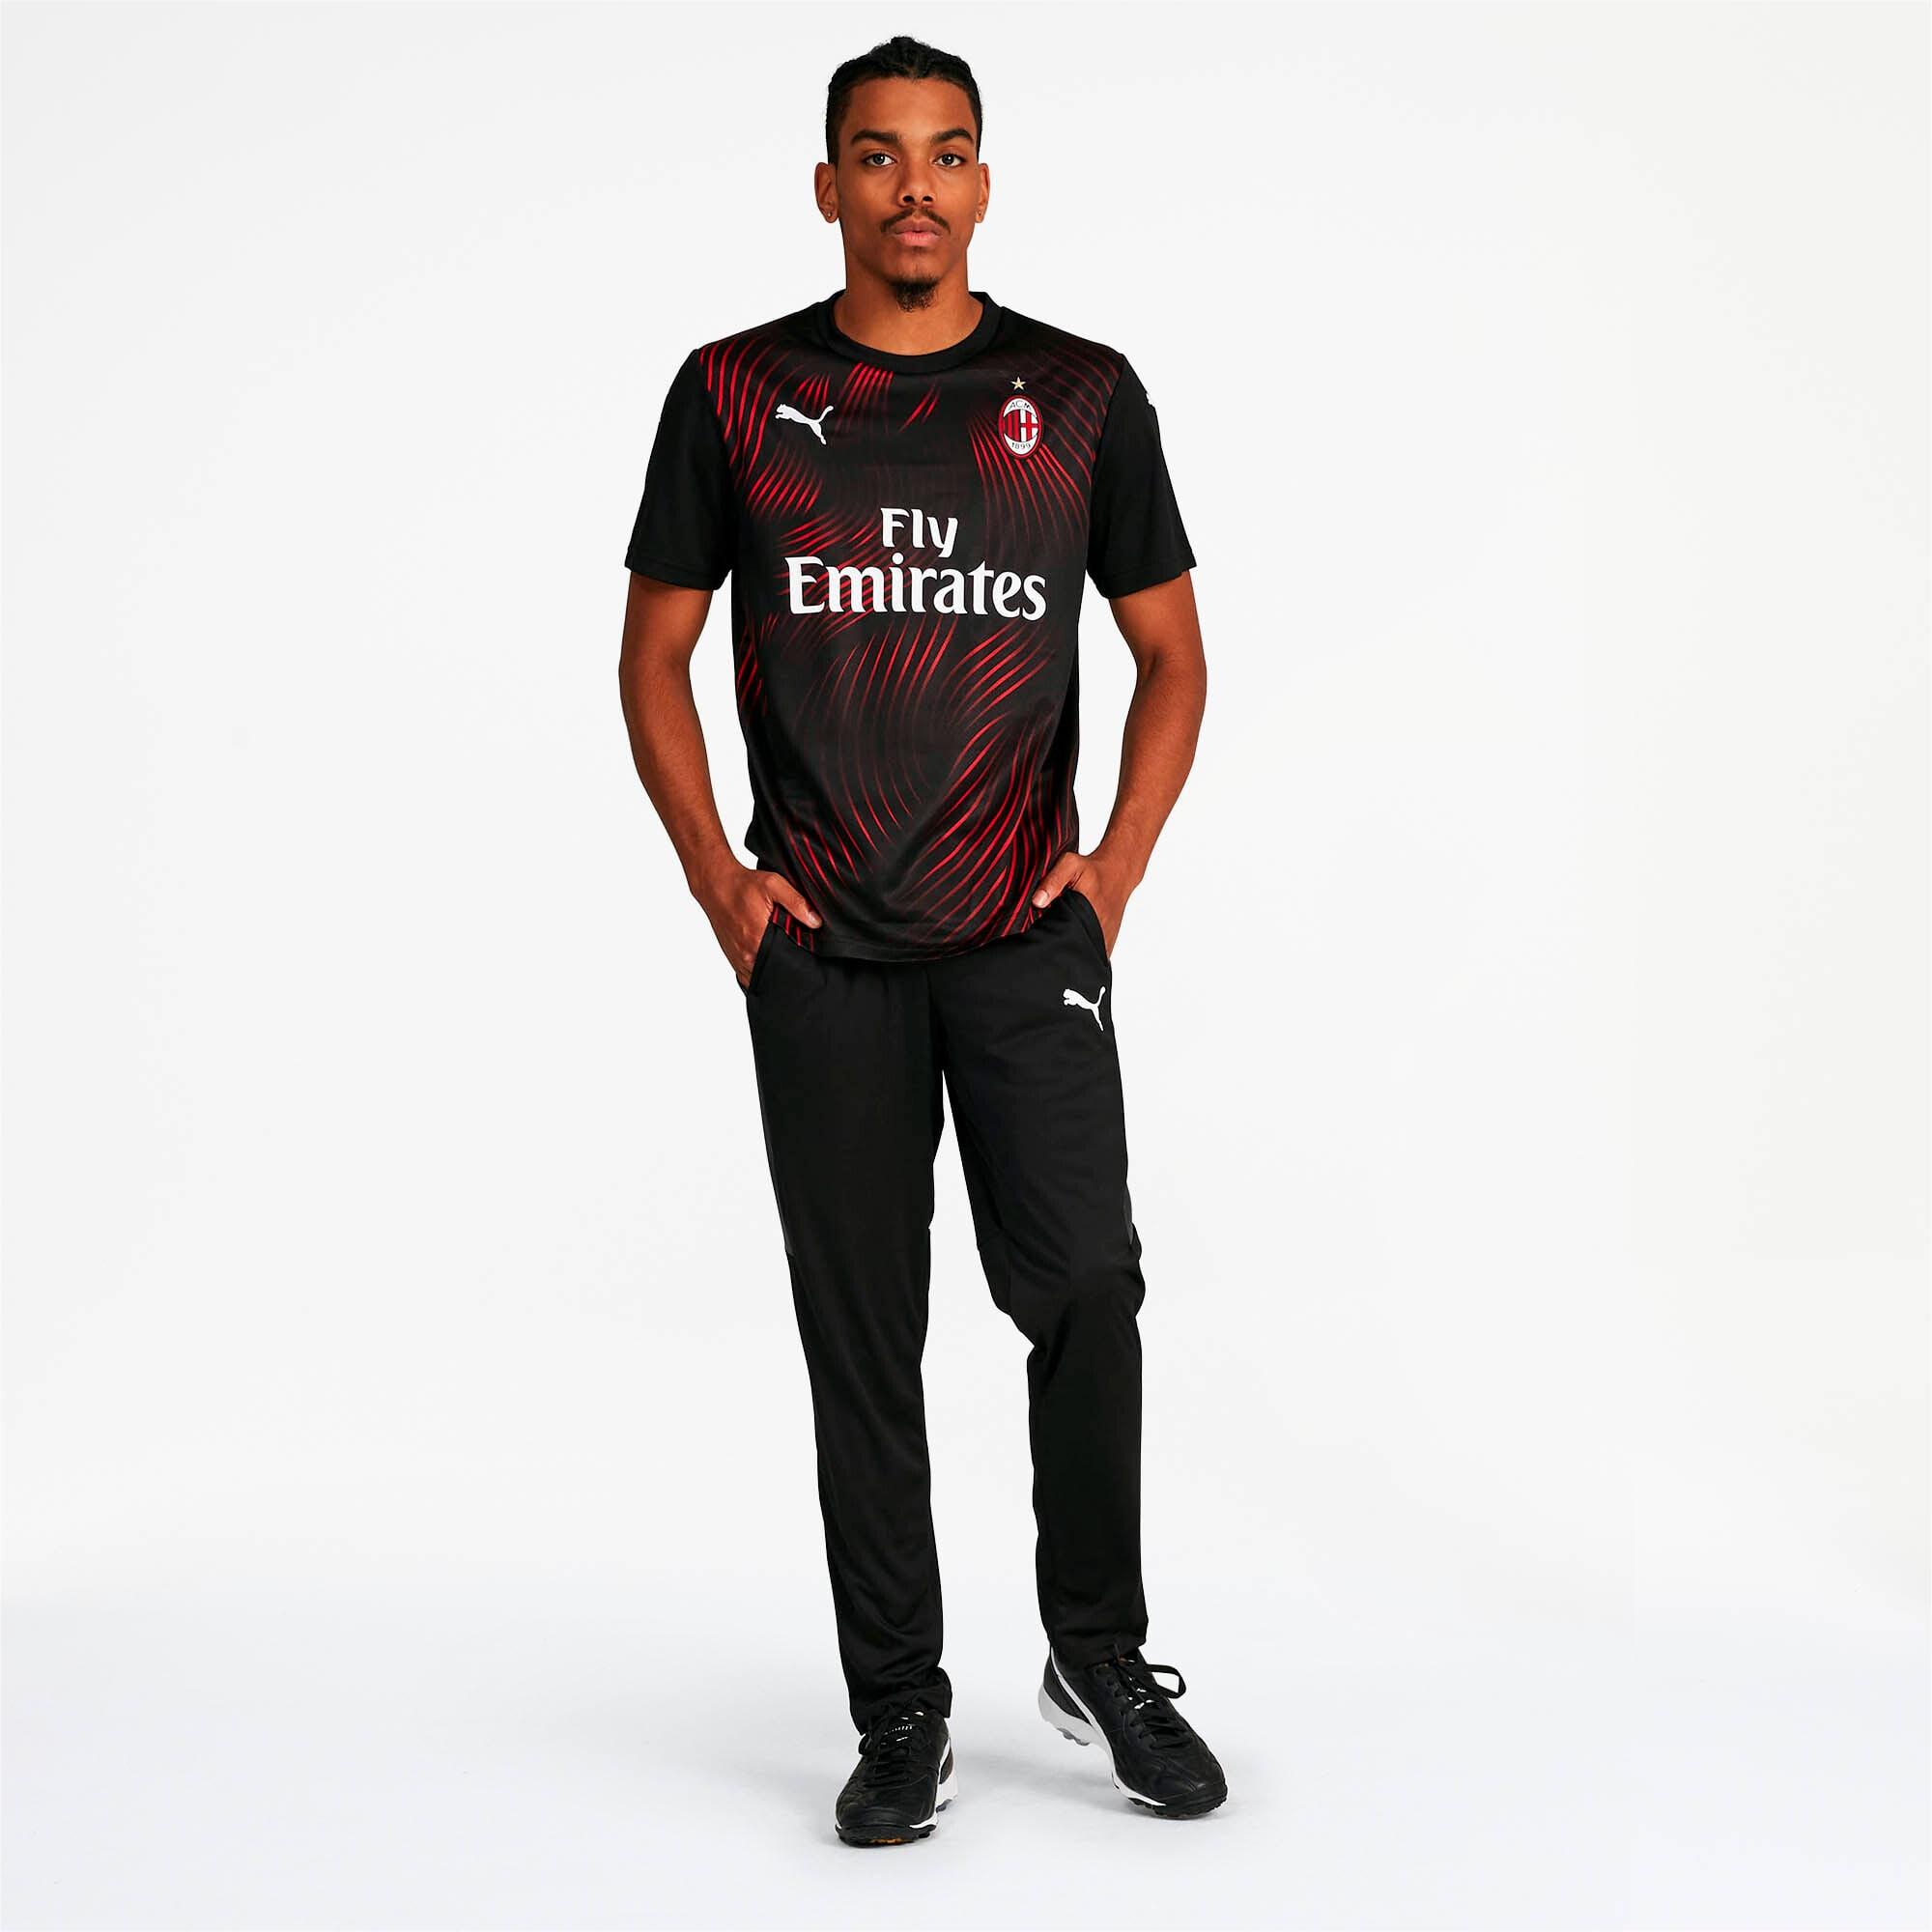 Thumbnail 3 of AC Milan Men's Third Replica Jersey, Puma Black-Tango Red, medium